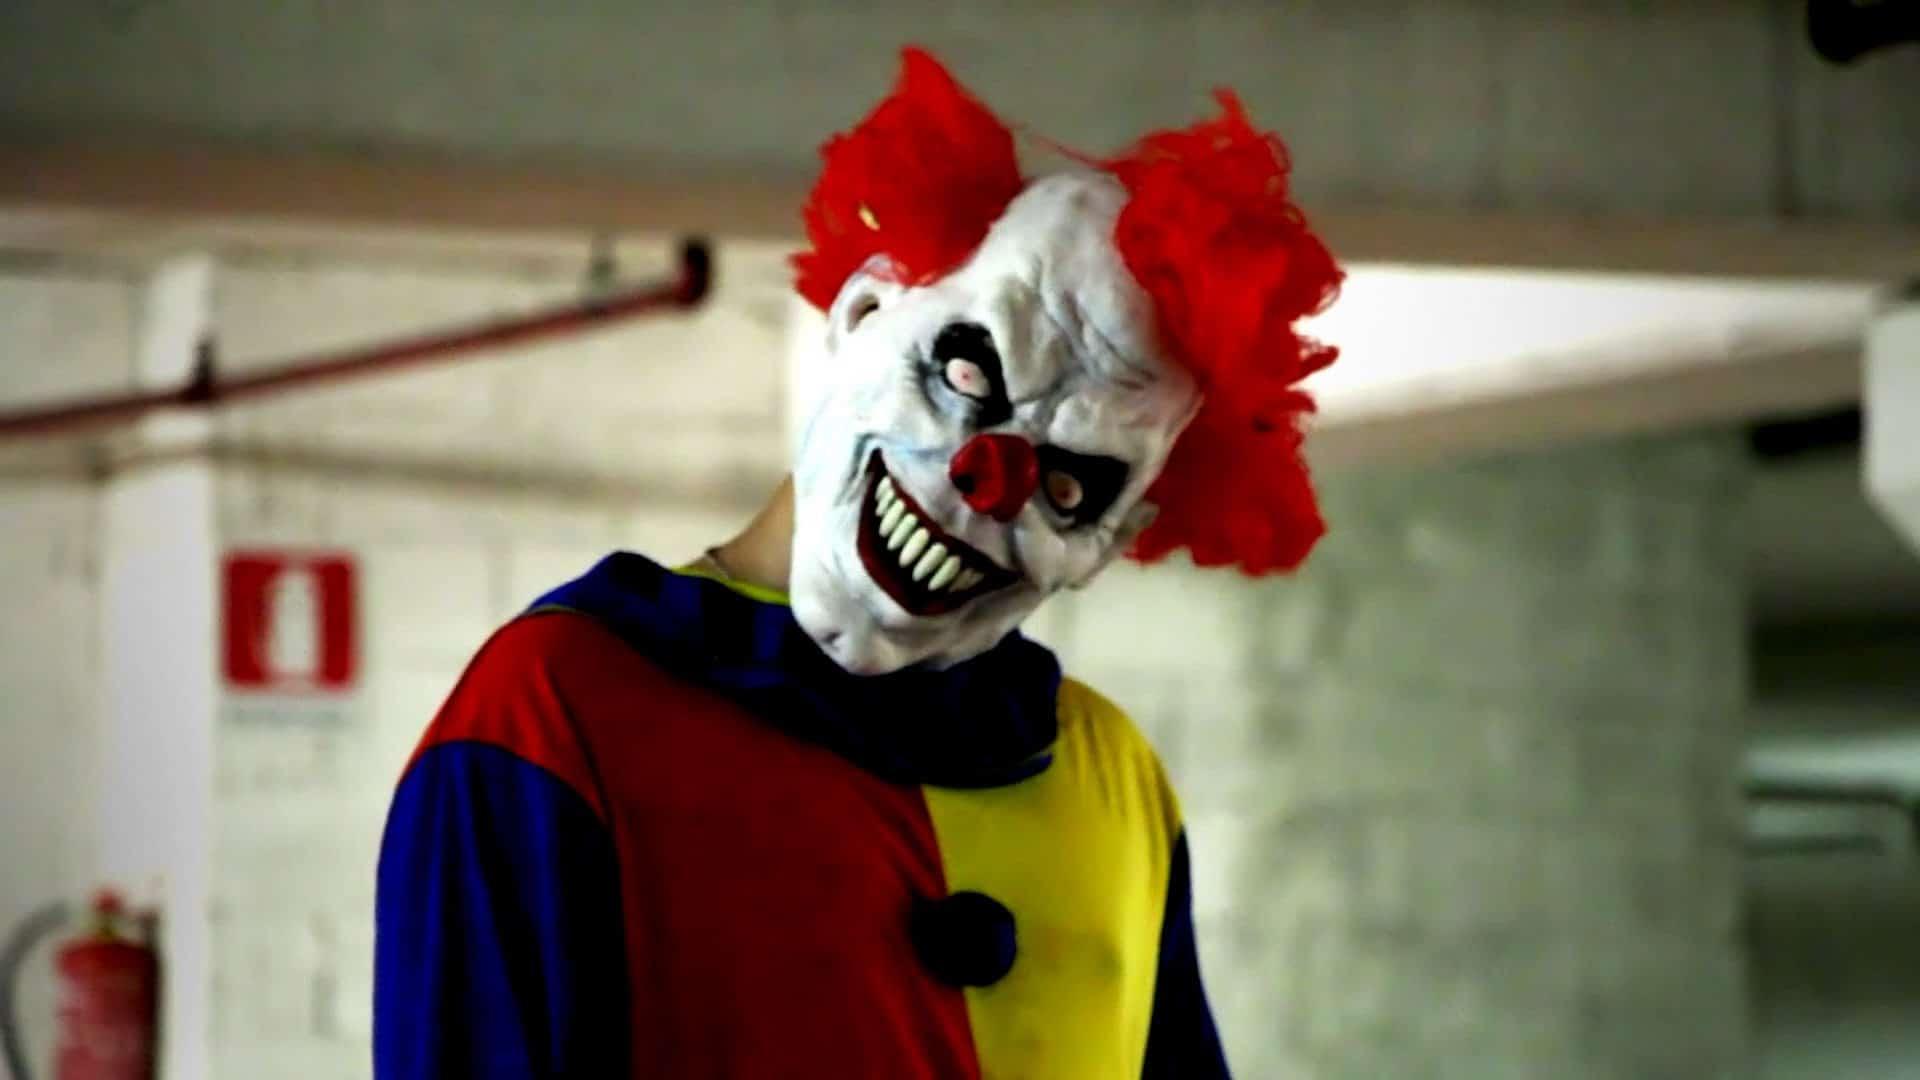 Killer Clown Prank Returns! (Video)